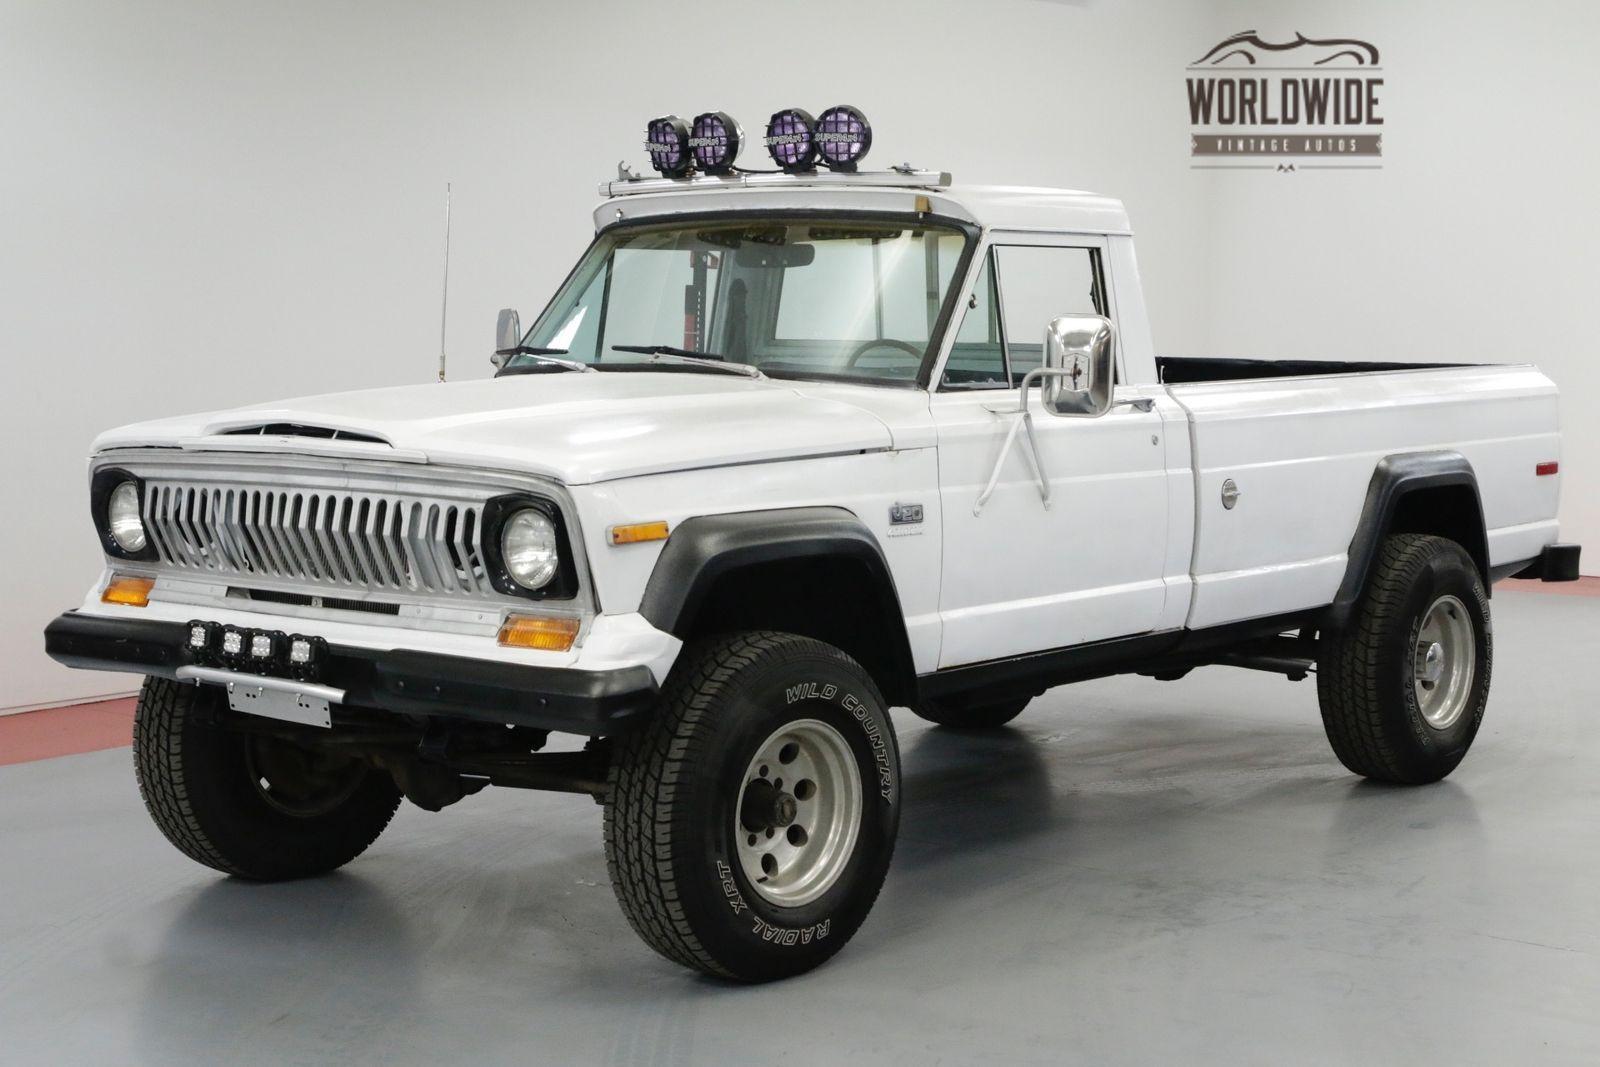 Jeep J20 J2000 V8 Gladiator Rare Driver 4x4 Ebay Jeep Classic Jeeps 4x4